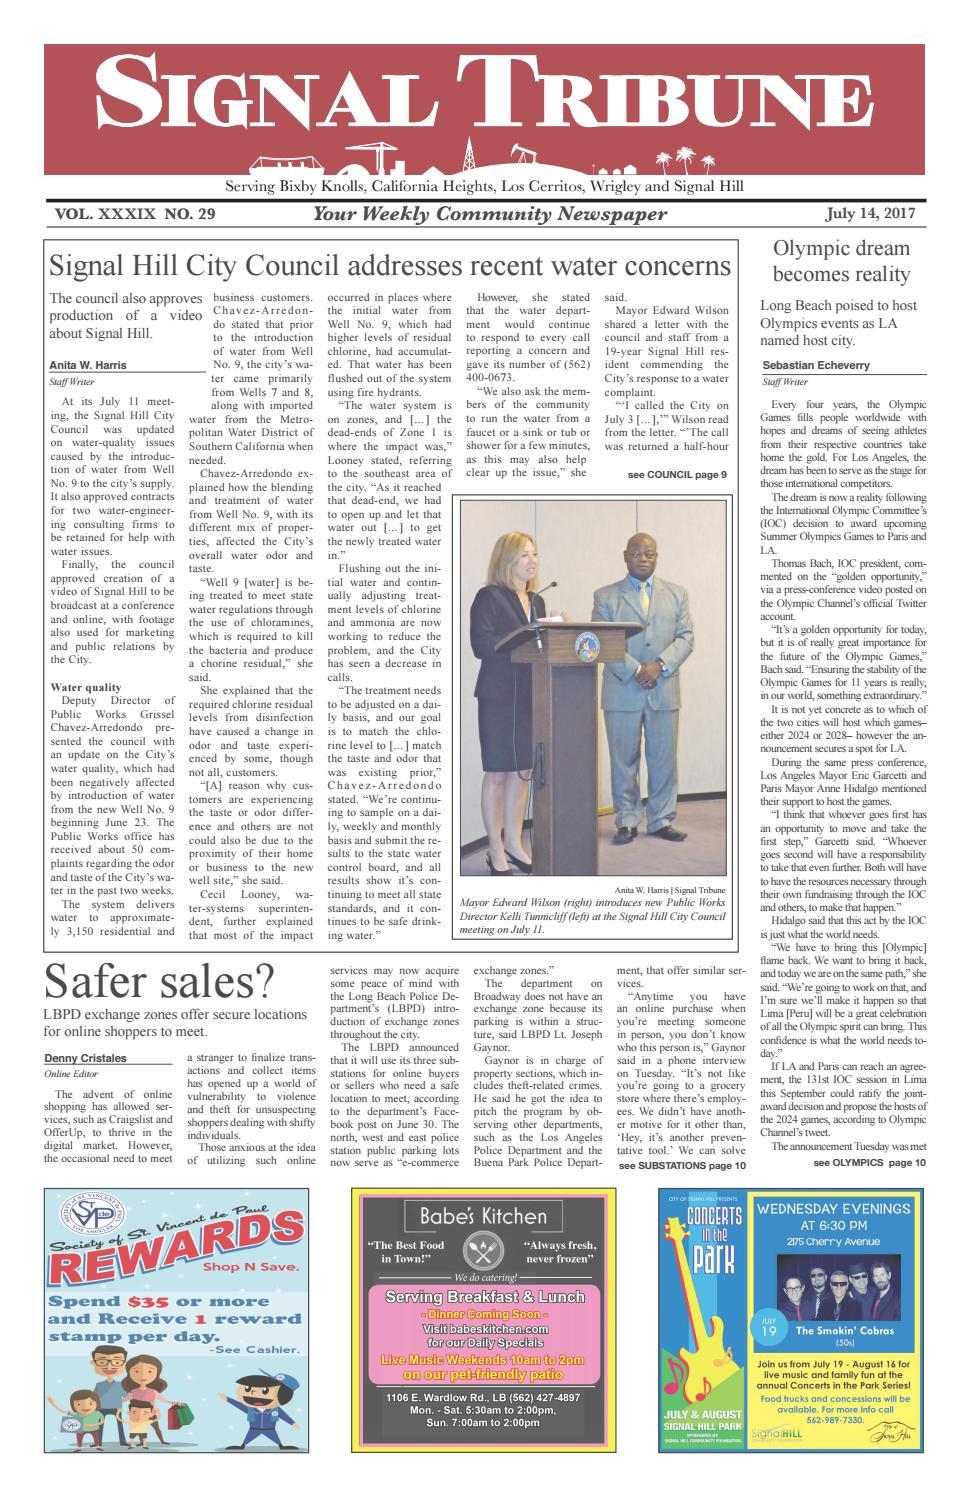 Signal Tribune July 14, 2017 by Signal Tribune - issuu